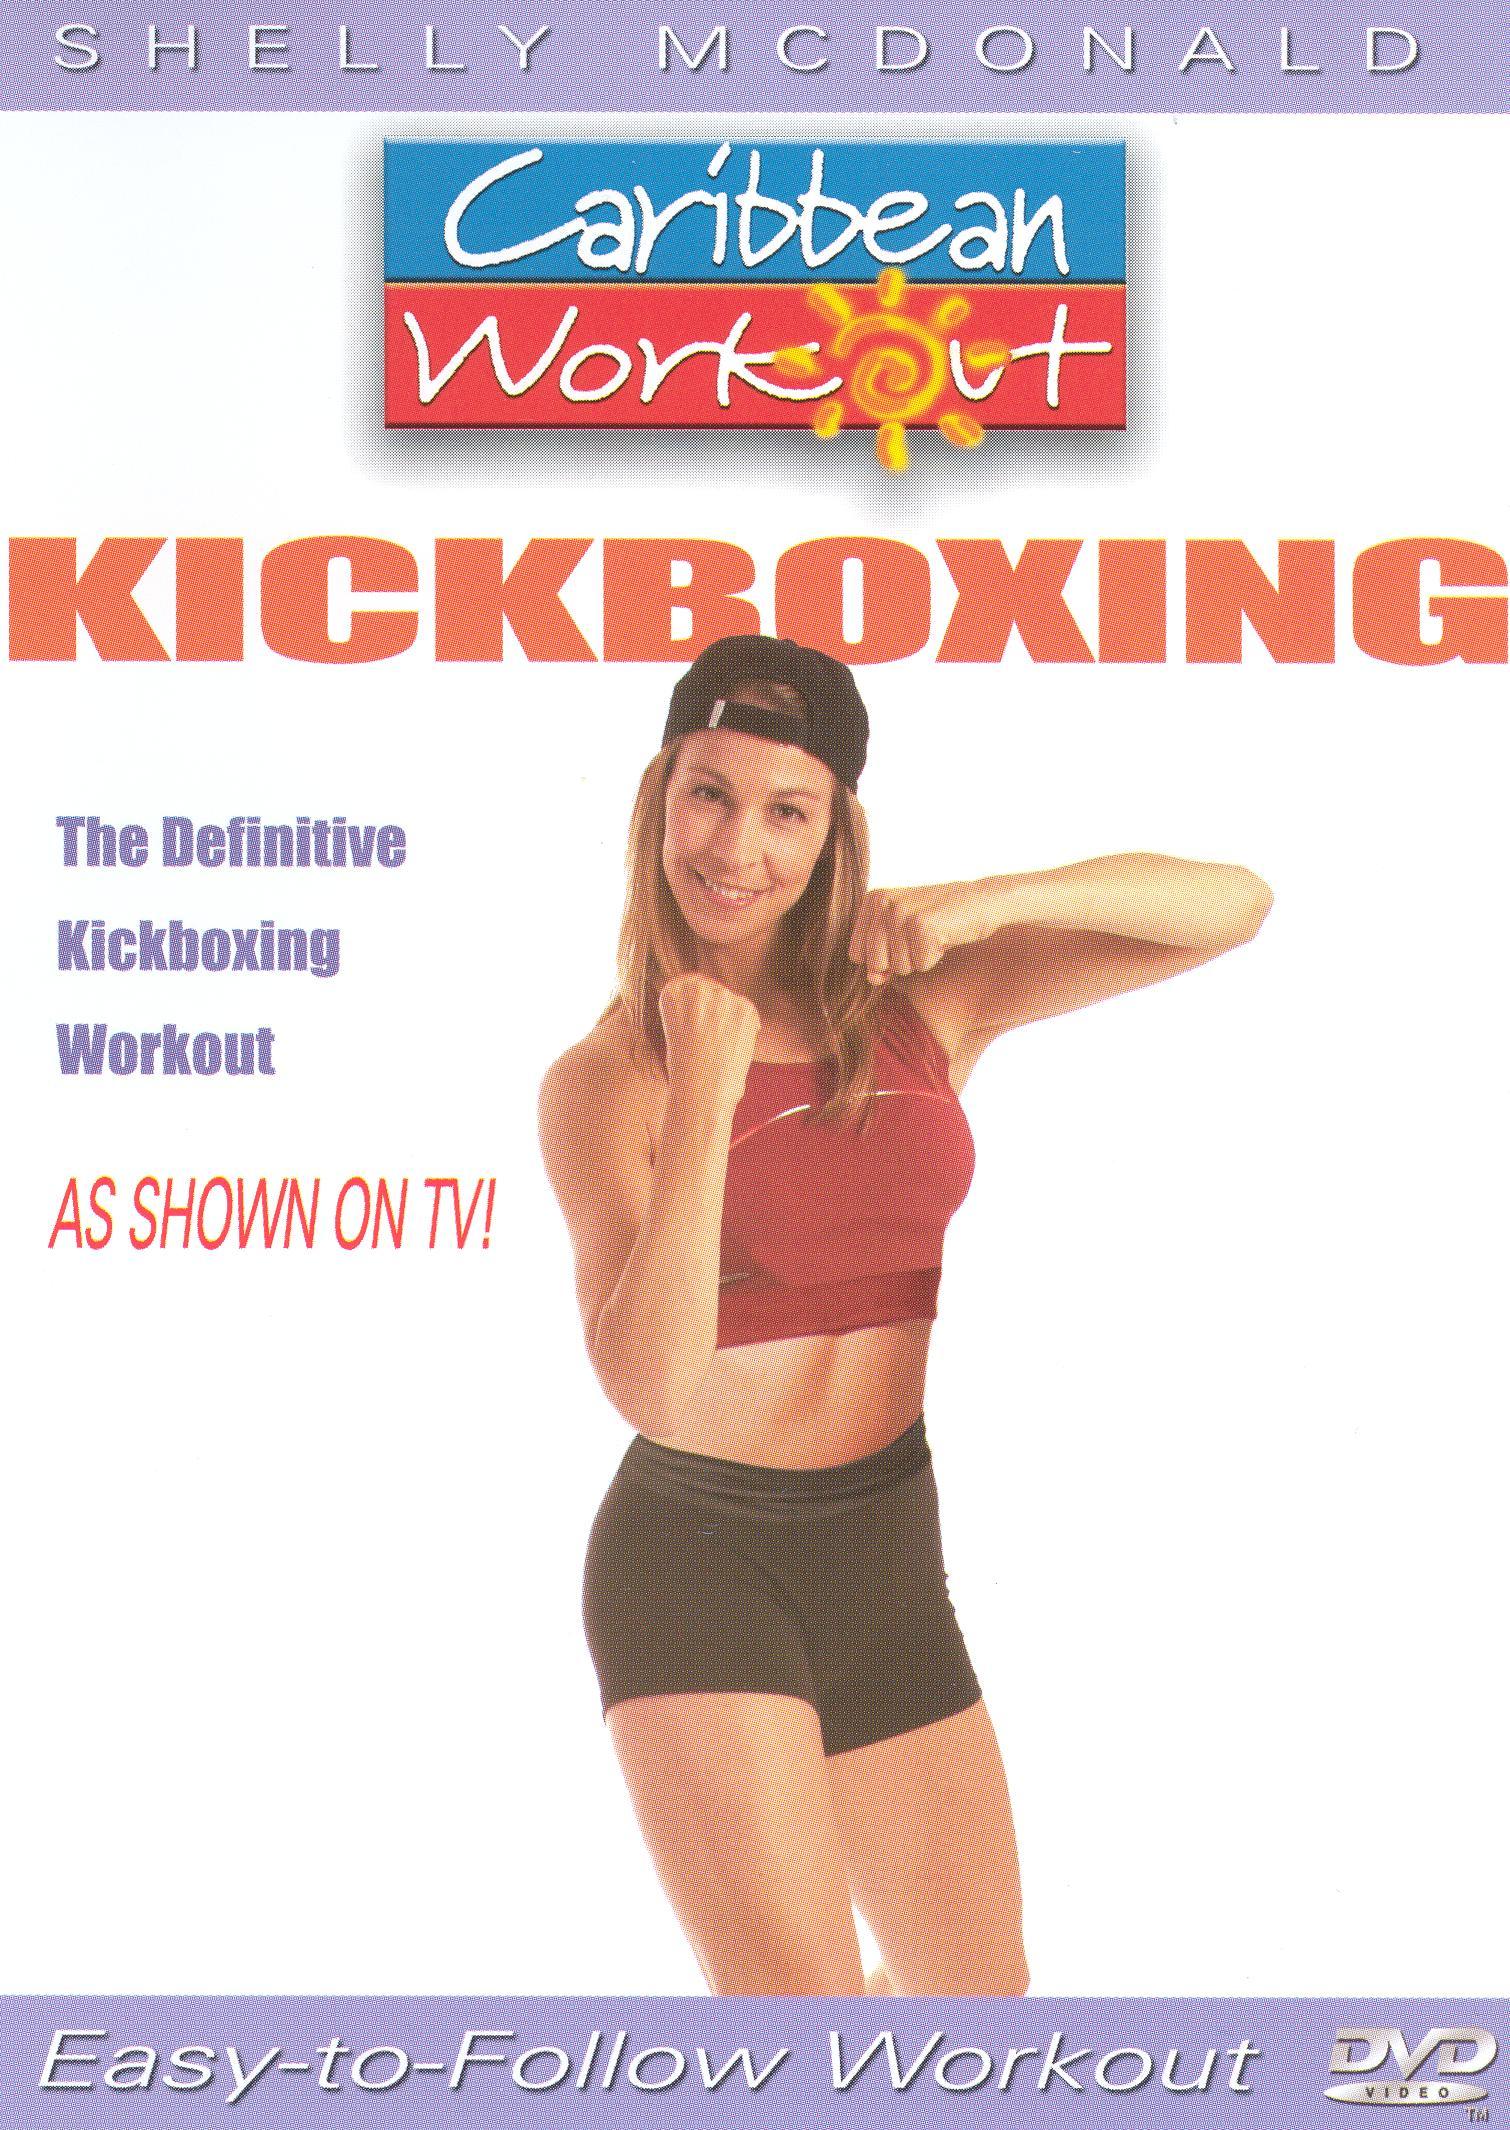 Caribbean Workout: Kickboxing